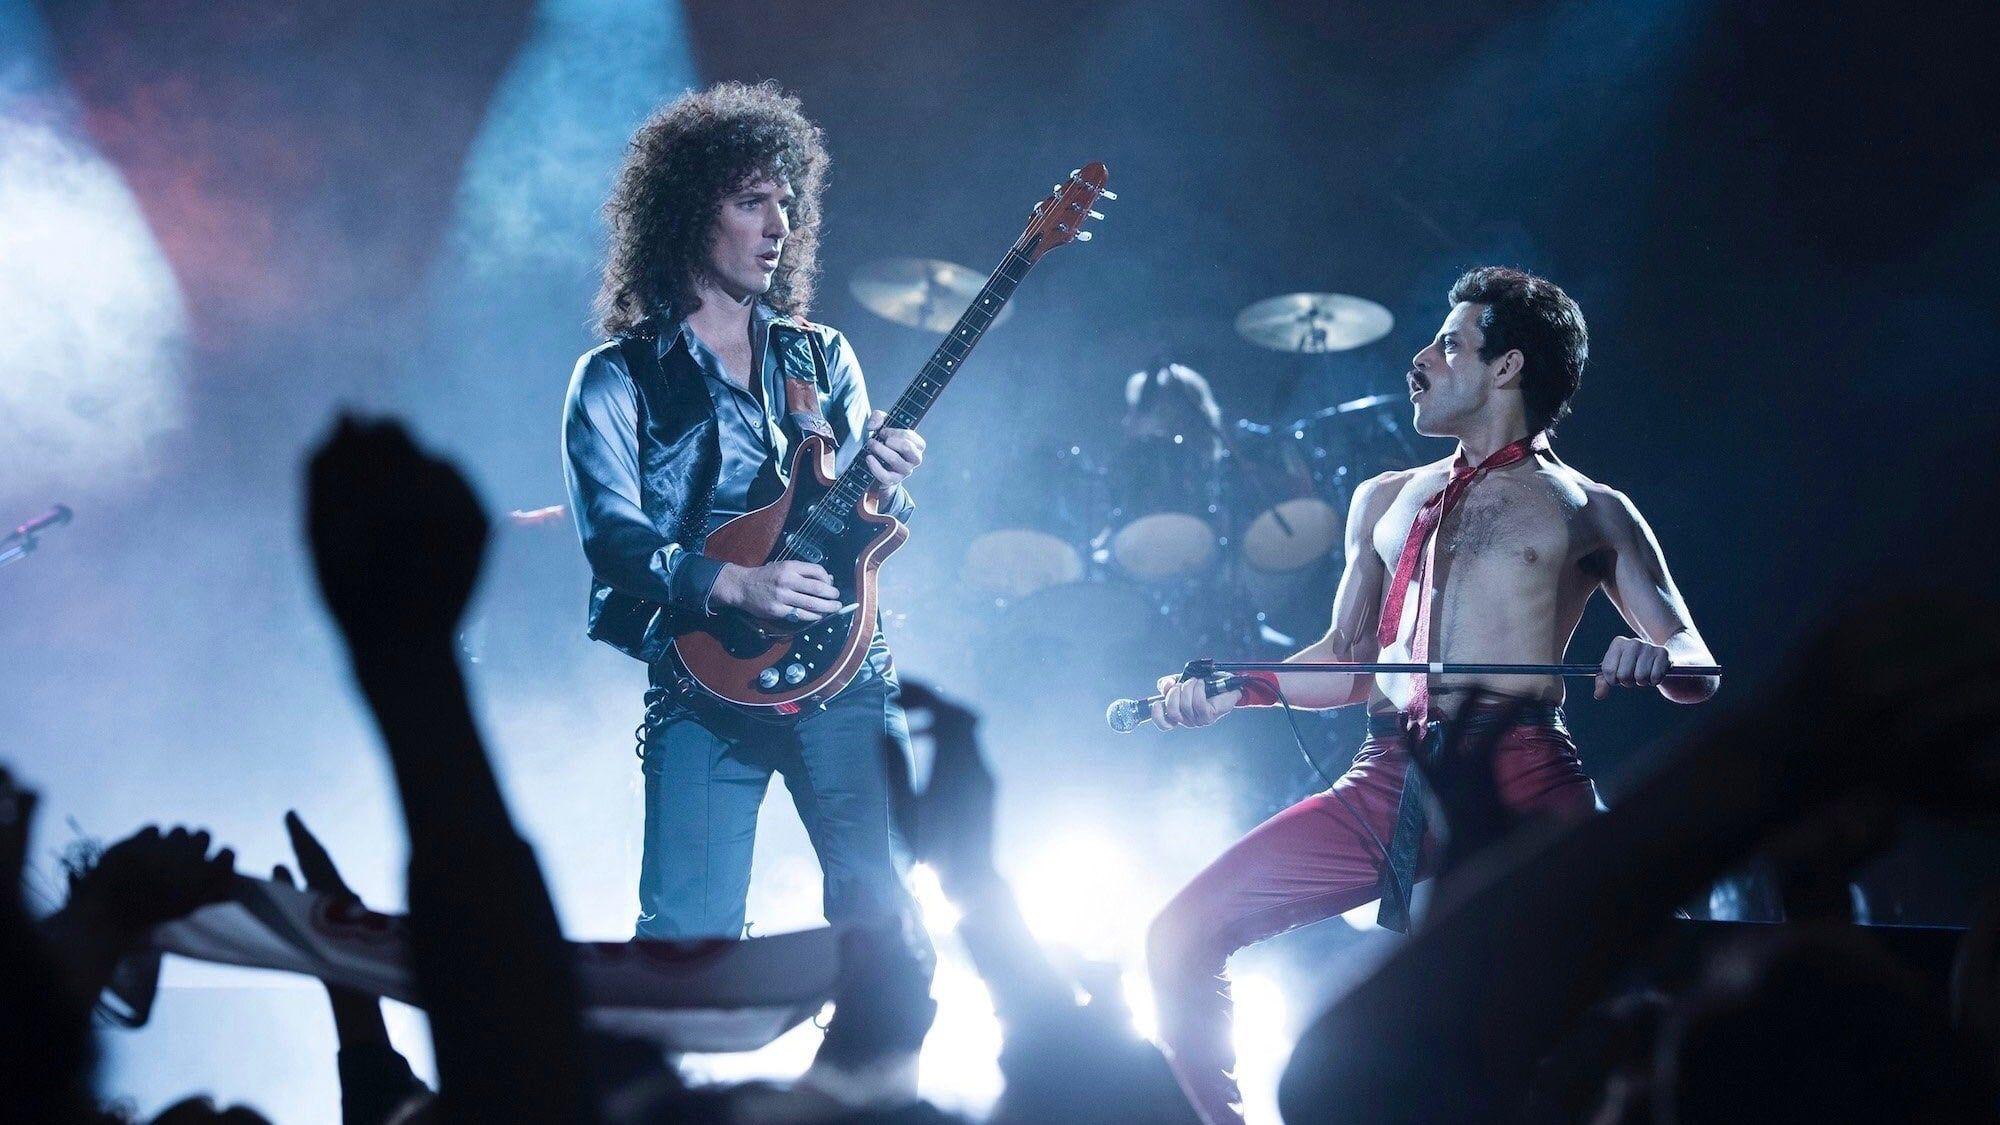 Bohemian Rhapsody Film Complet En France Hd Sous Titre Actionmovie Film Video Spymovie Newhindi Dubbed Bohemian Rhapsody Bryan Singer Freddie Mercury